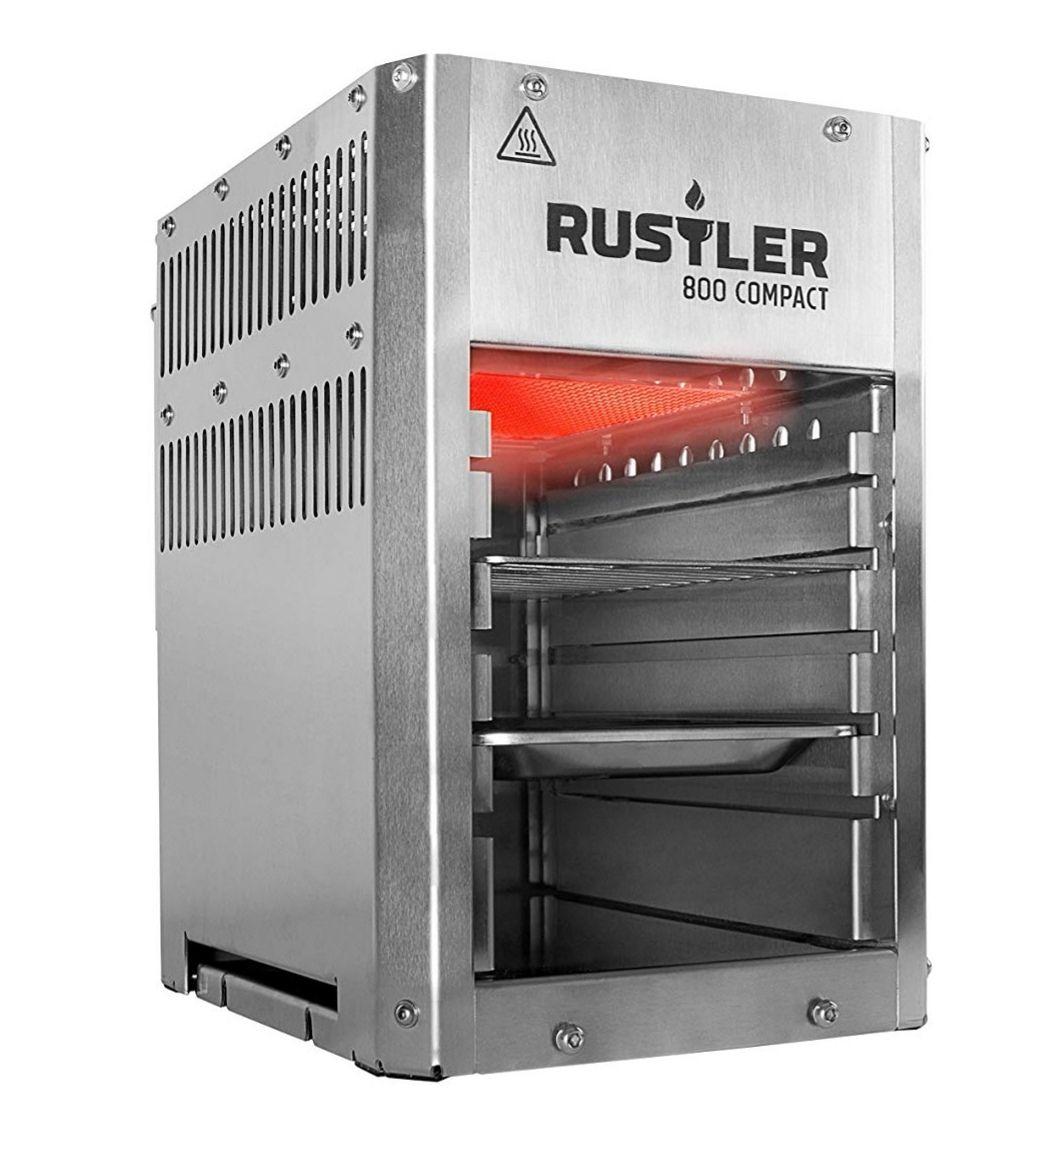 [Amazon] Rustler Oberhitze Gasgrill für 99€